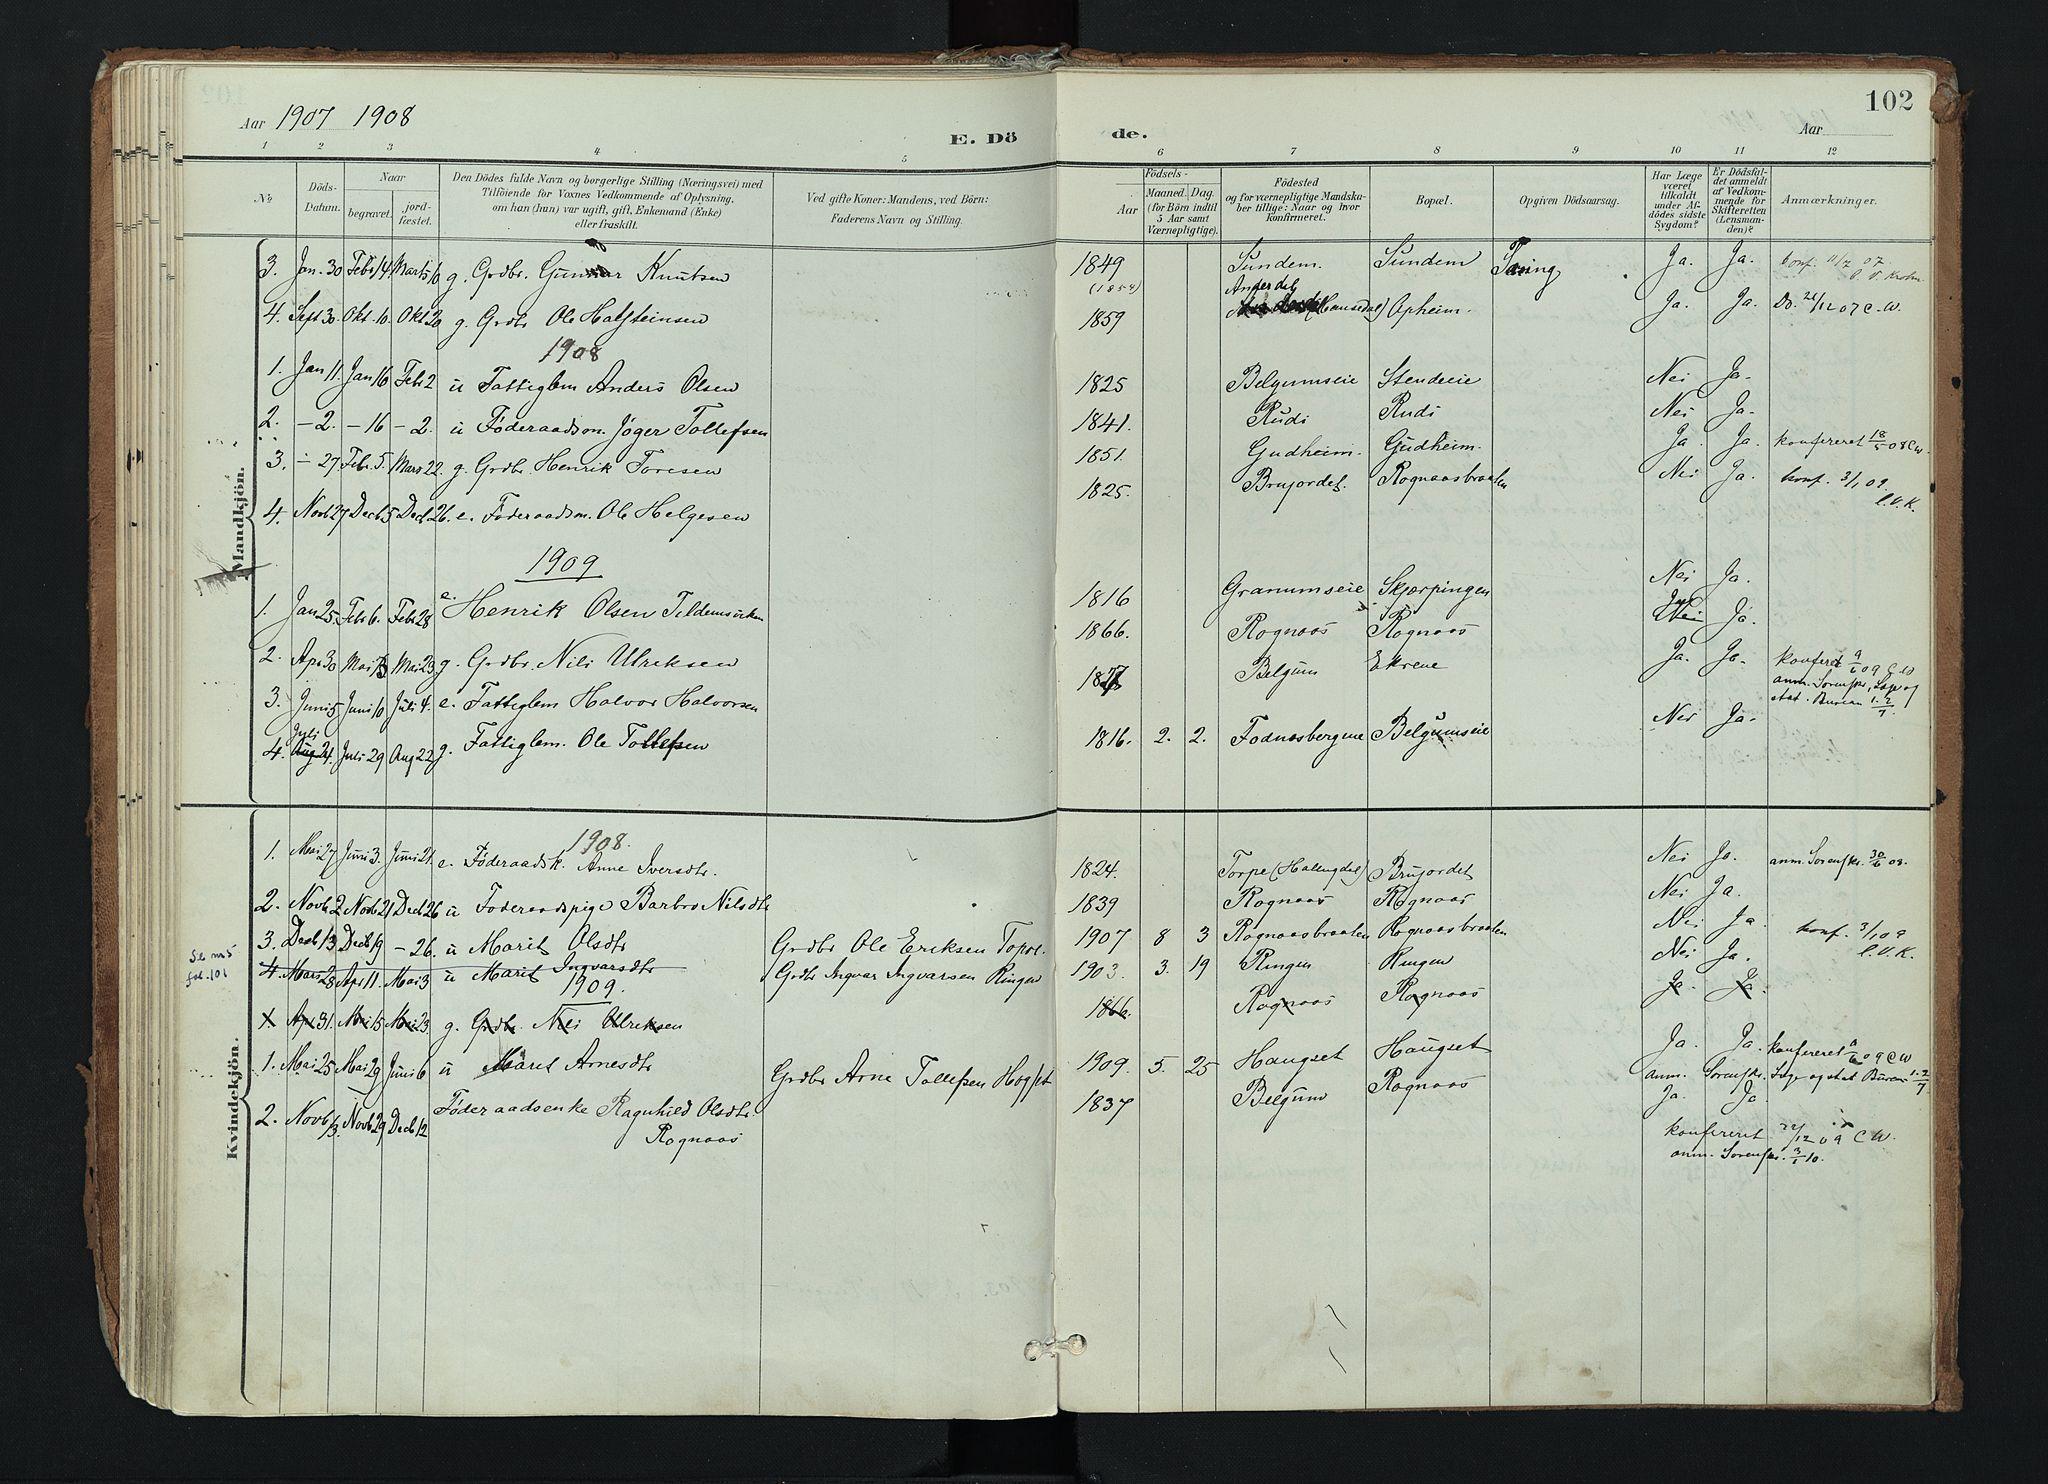 SAH, Nord-Aurdal prestekontor, Ministerialbok nr. 17, 1897-1926, s. 102